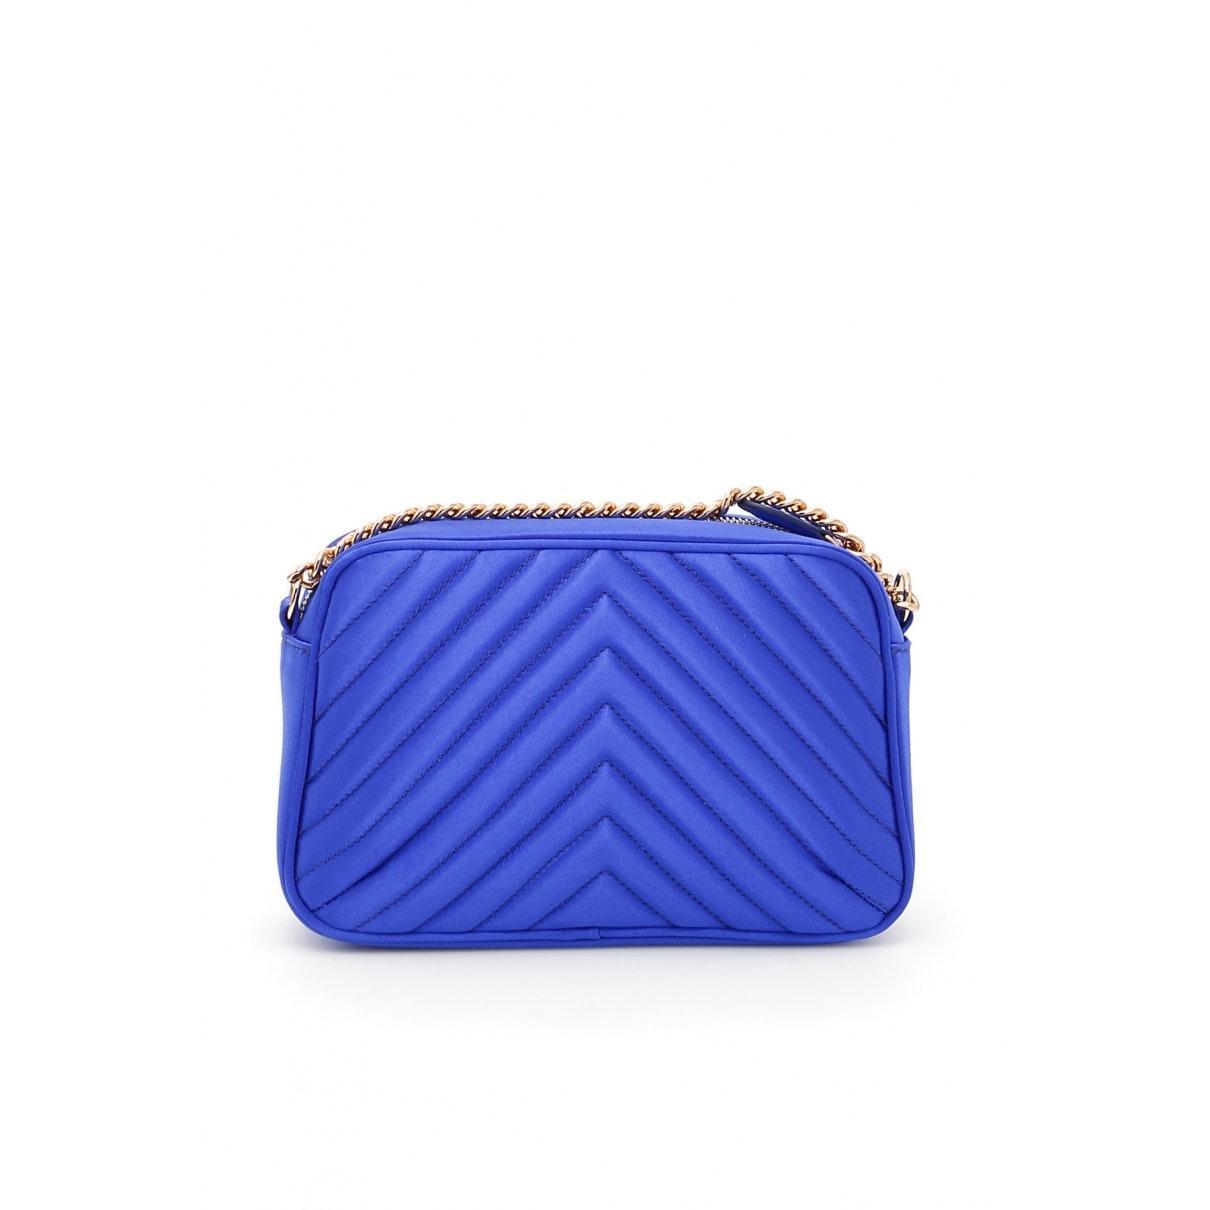 Sac à main en Synthétique Bleu Stella McCartney en coloris Bleu g3F8